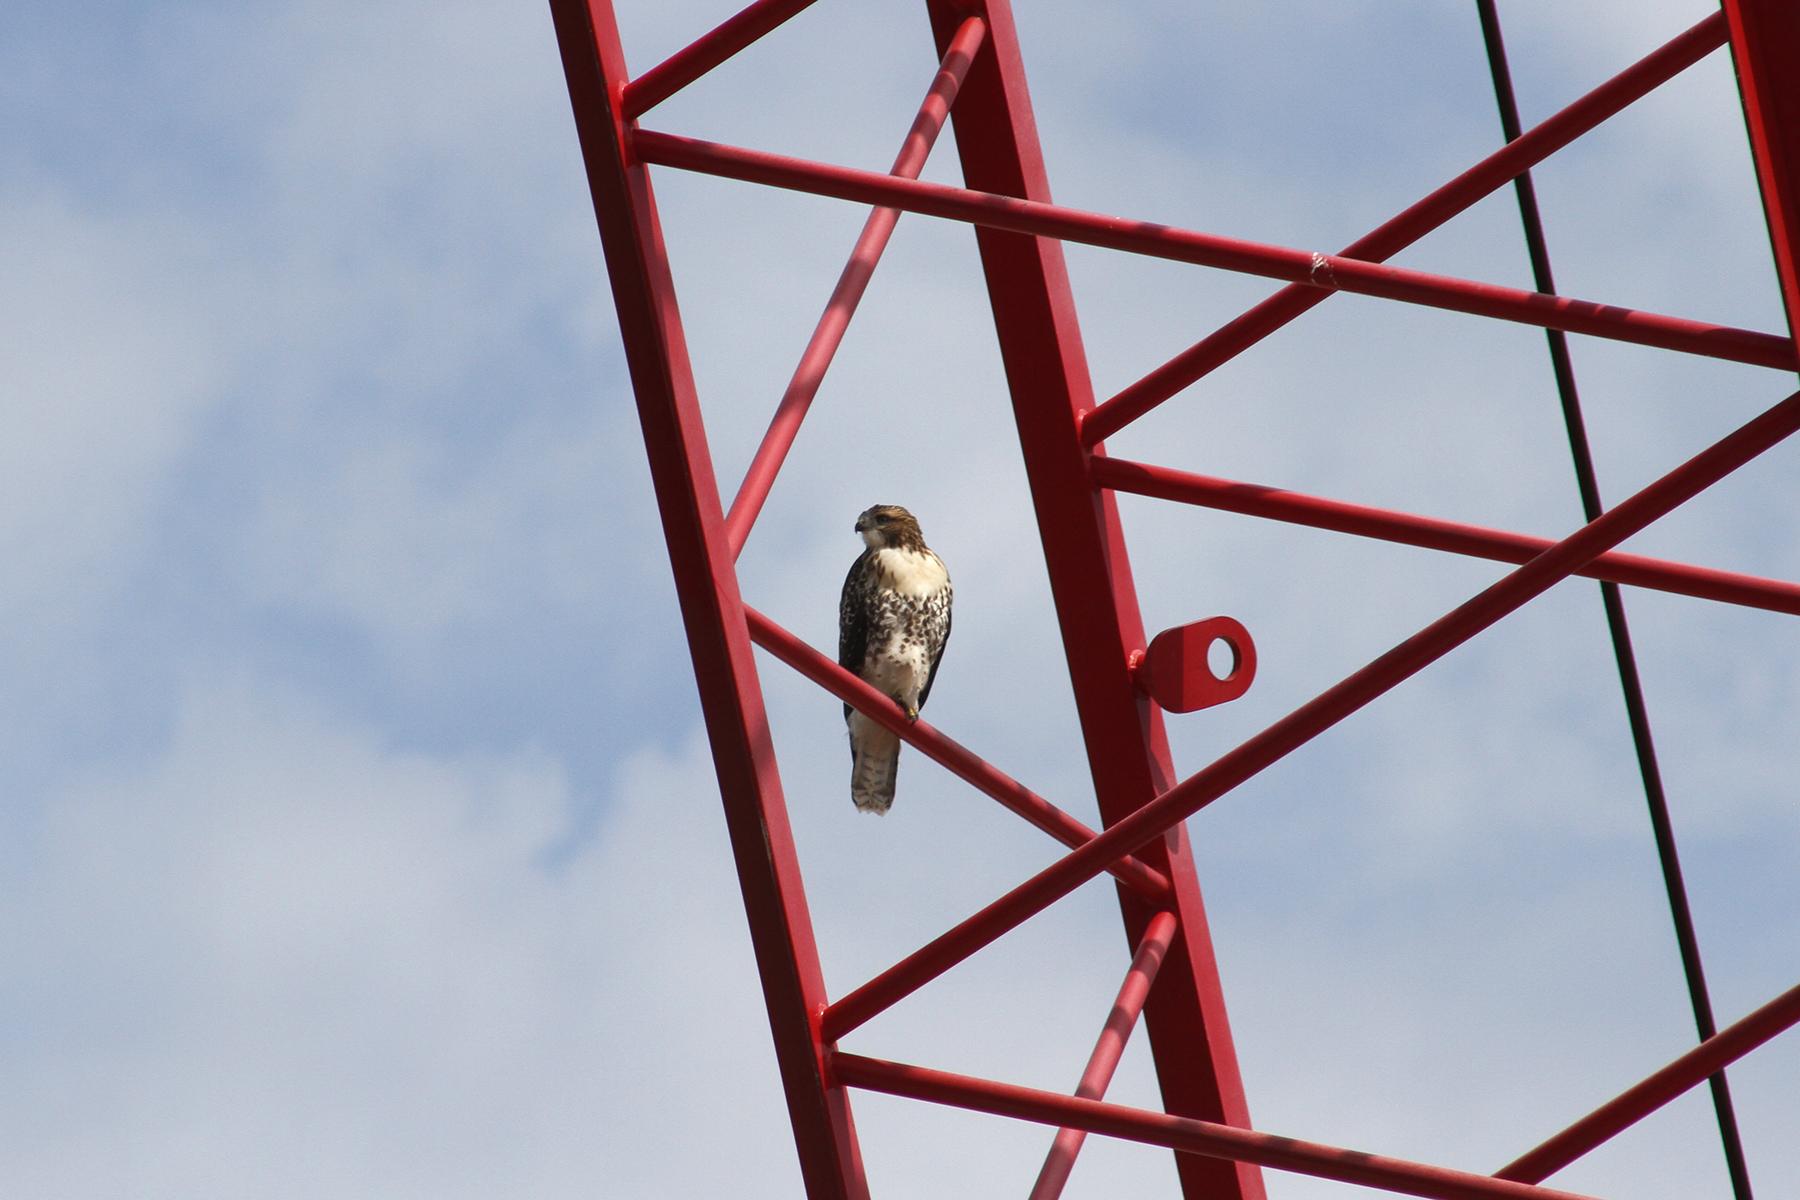 Hawk on crane